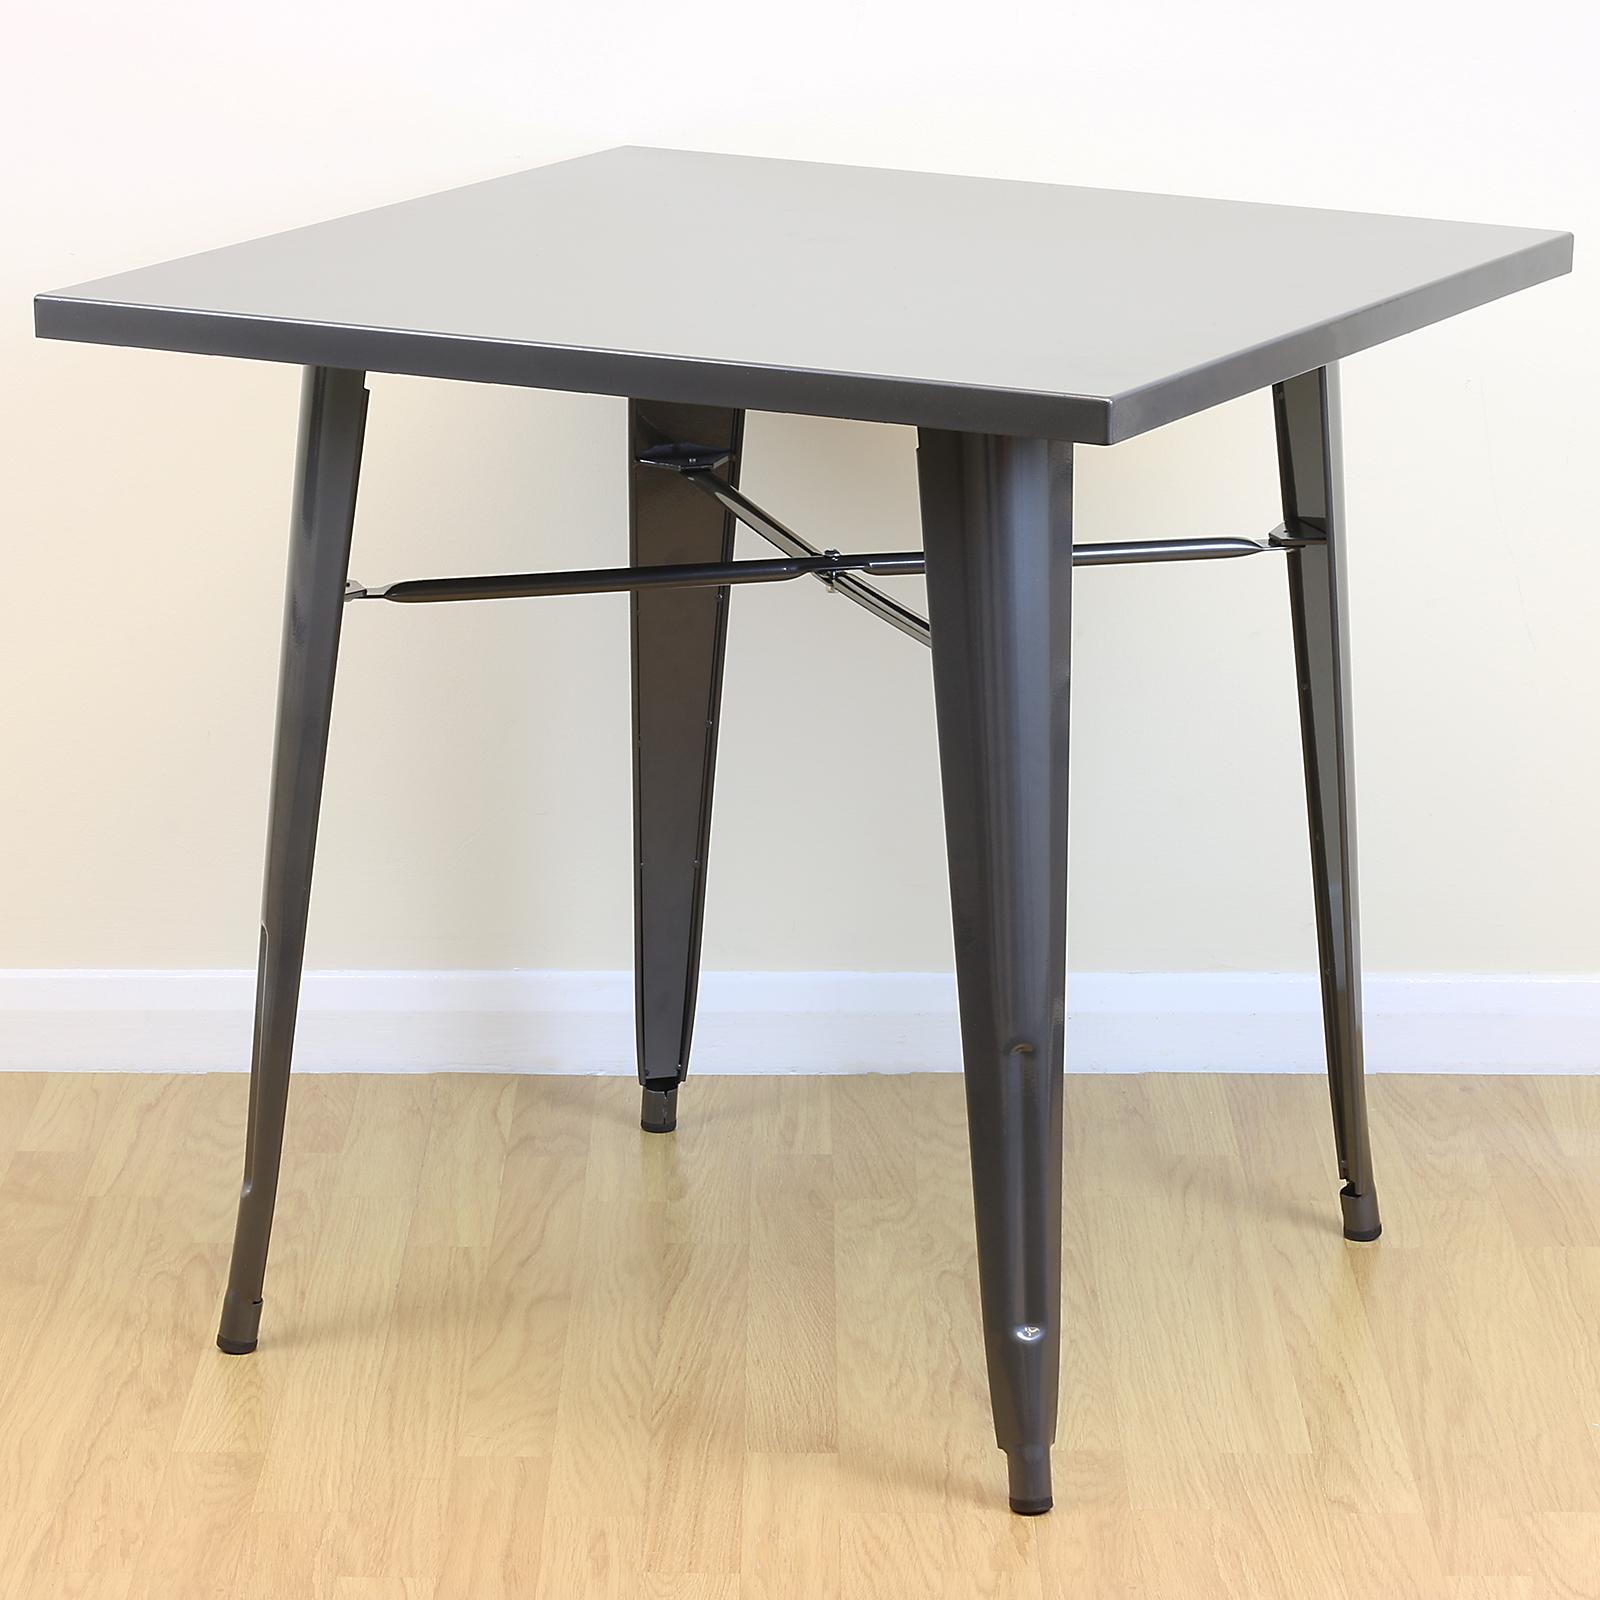 square gunmetal kitchen/dining/cafe metal table 2/4 seater